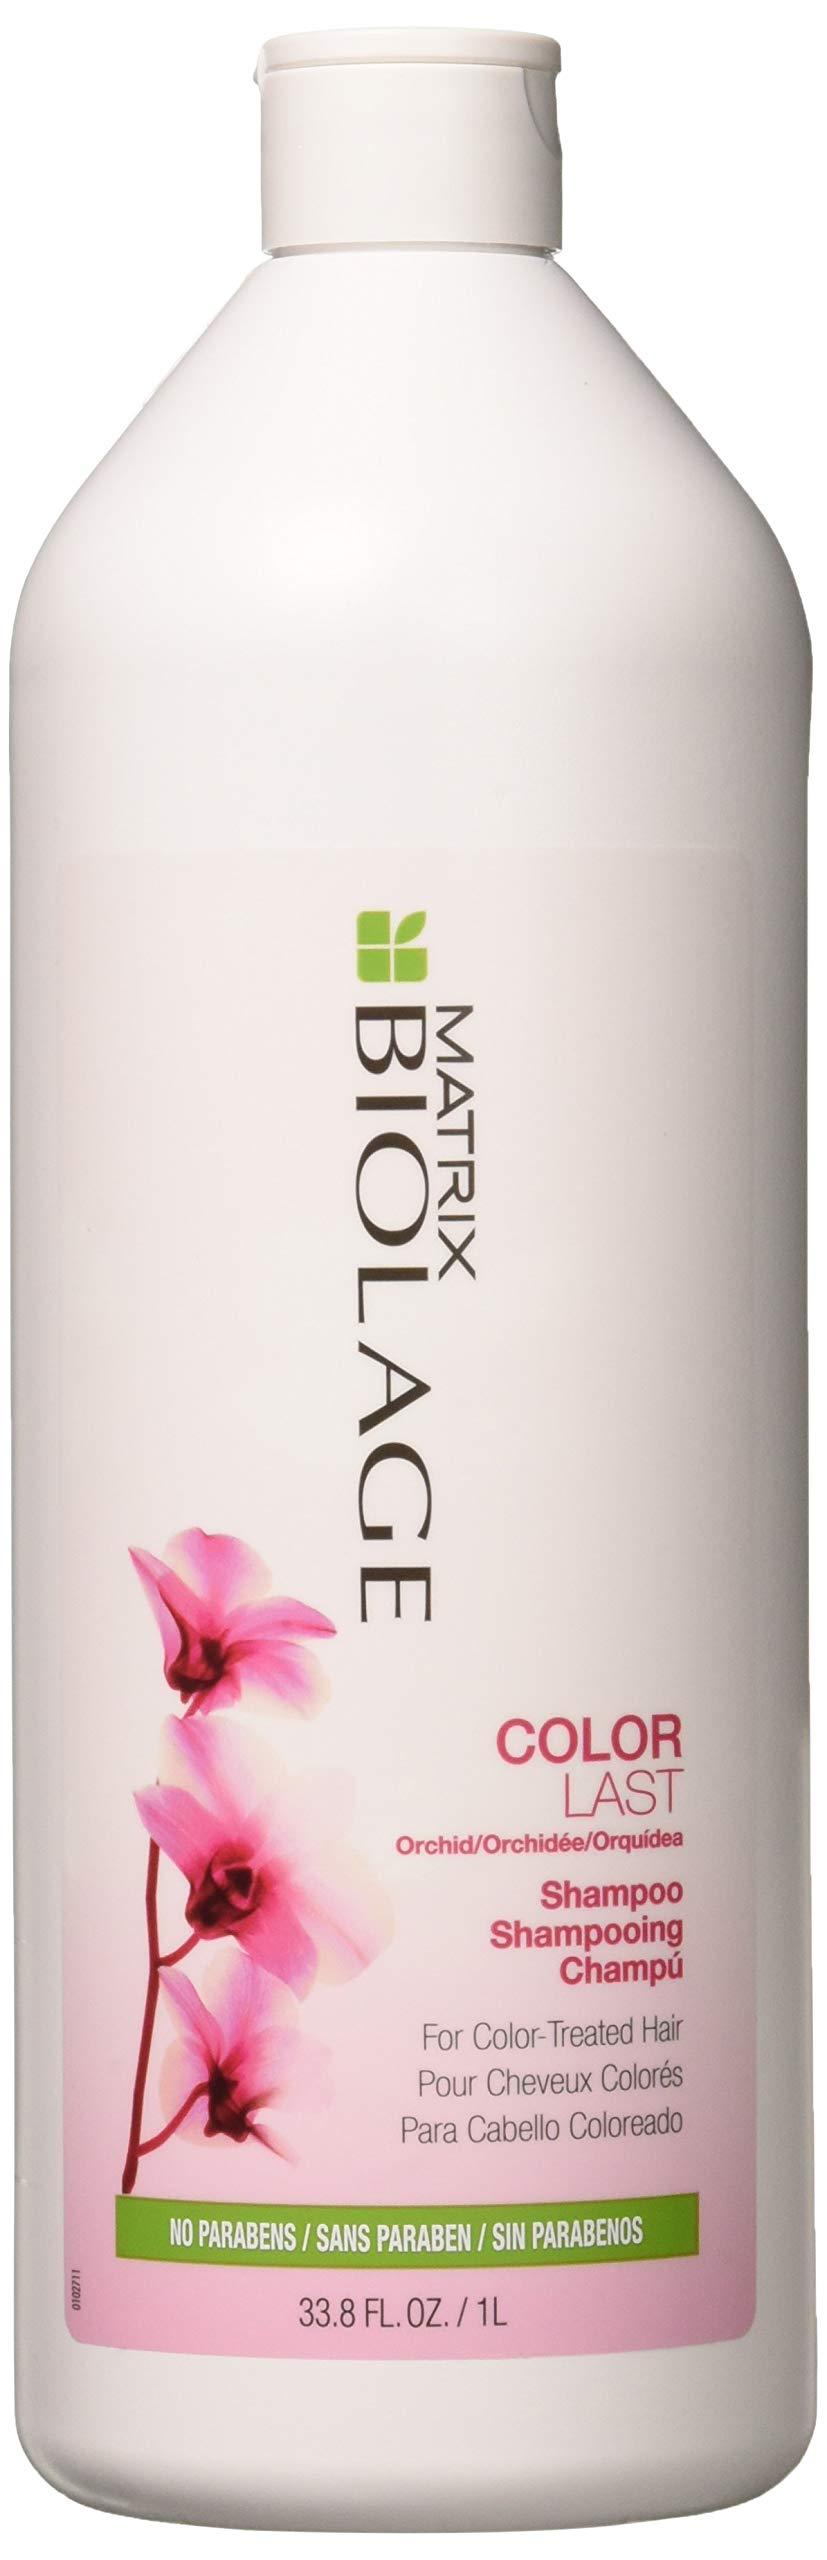 Matrix Biolage ColorLast Shampoo and Conditioner 33.8 Ounce Set by Biolage Matrix